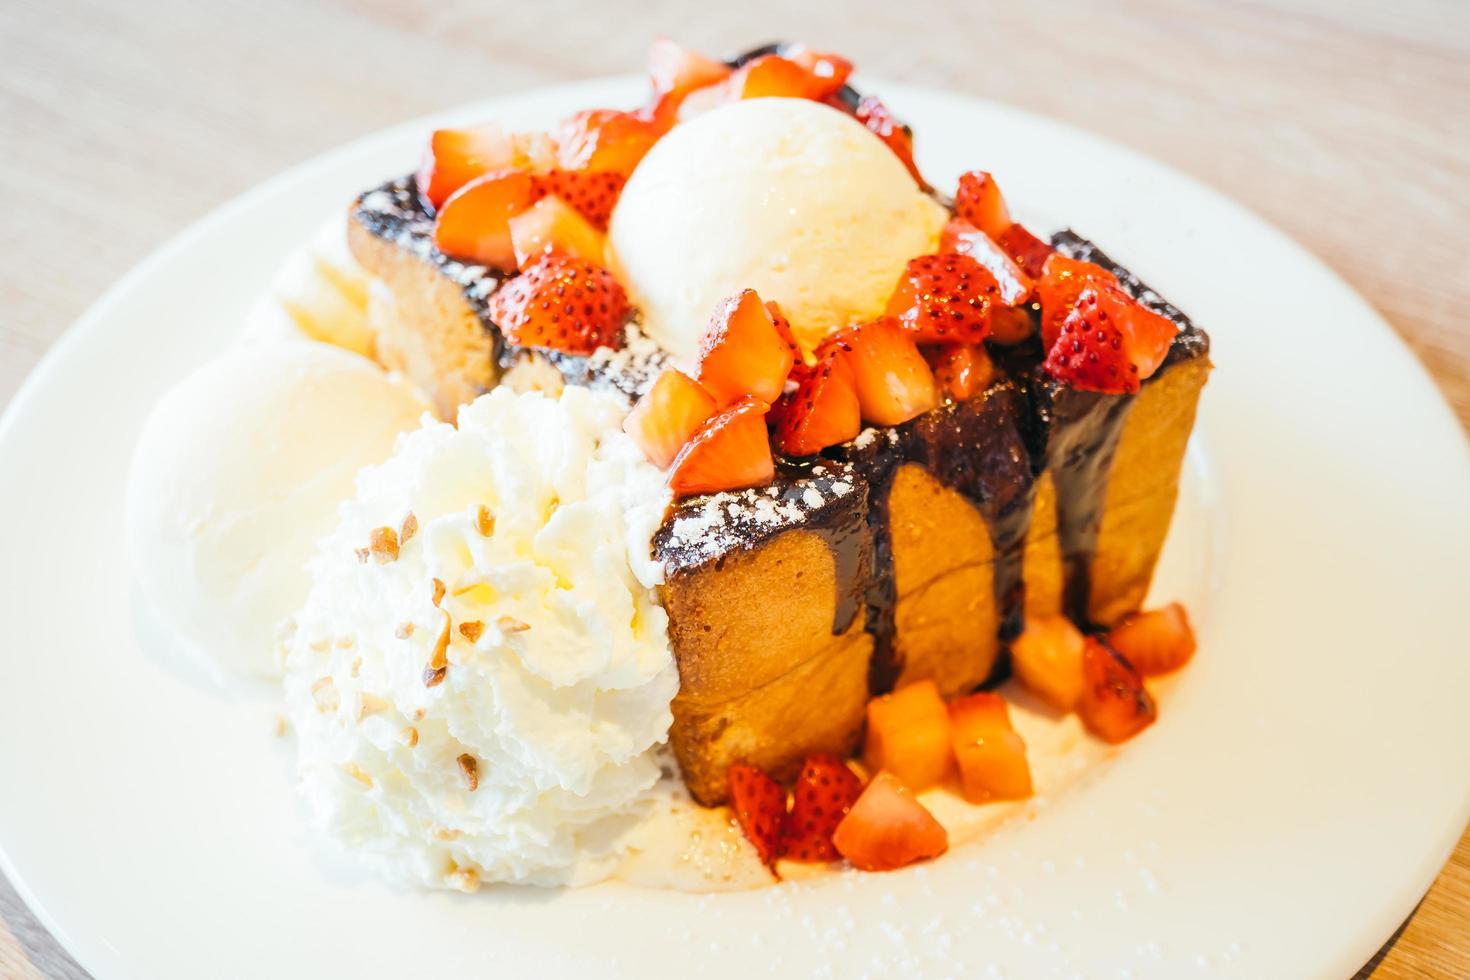 Honey toast with ice cream and strawberry and banana photo